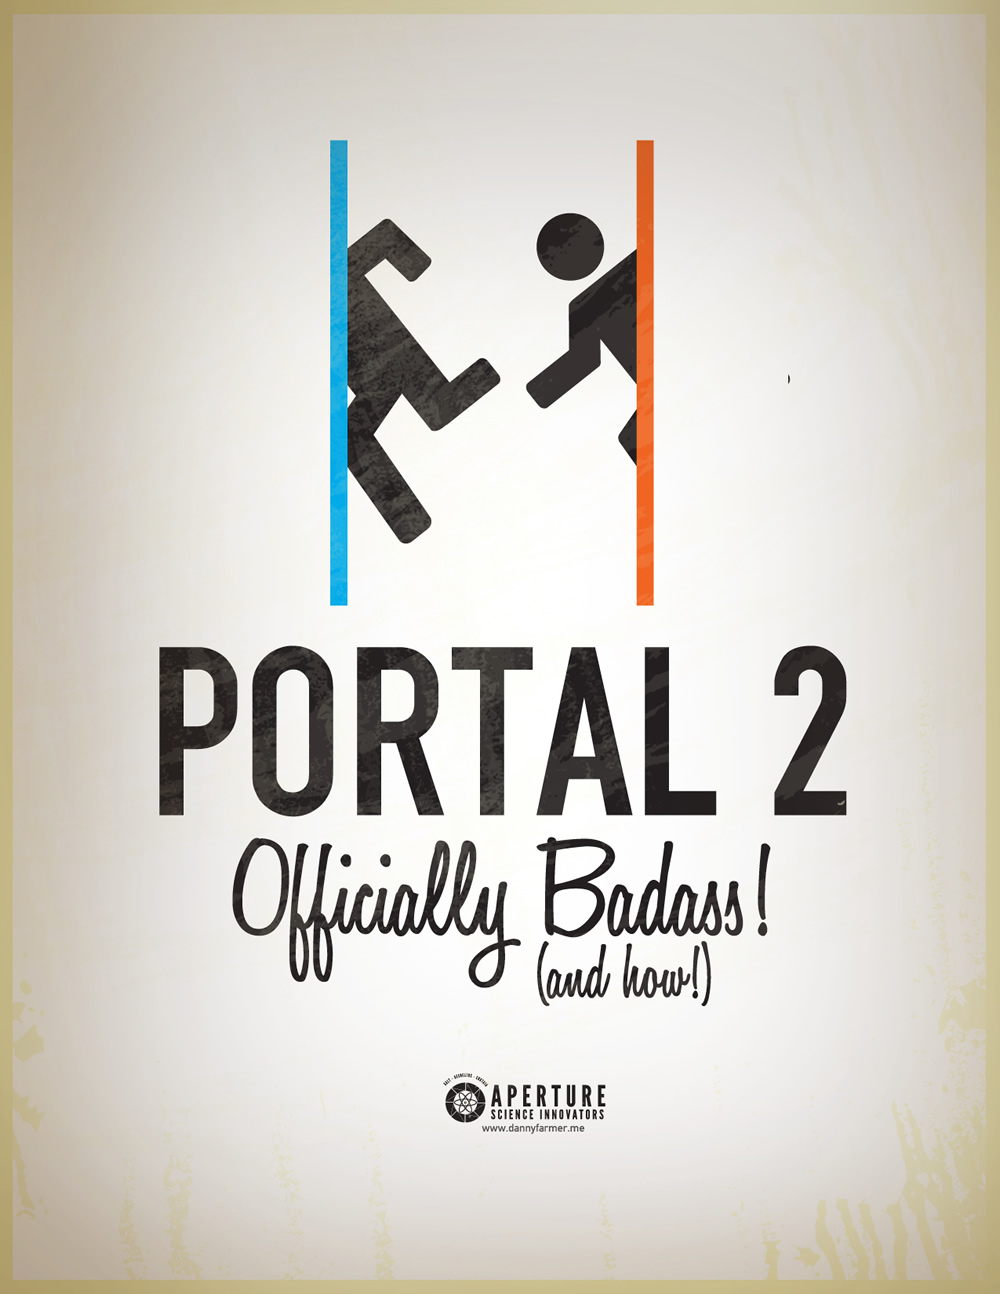 ten stunning portal 2 propaganda posters